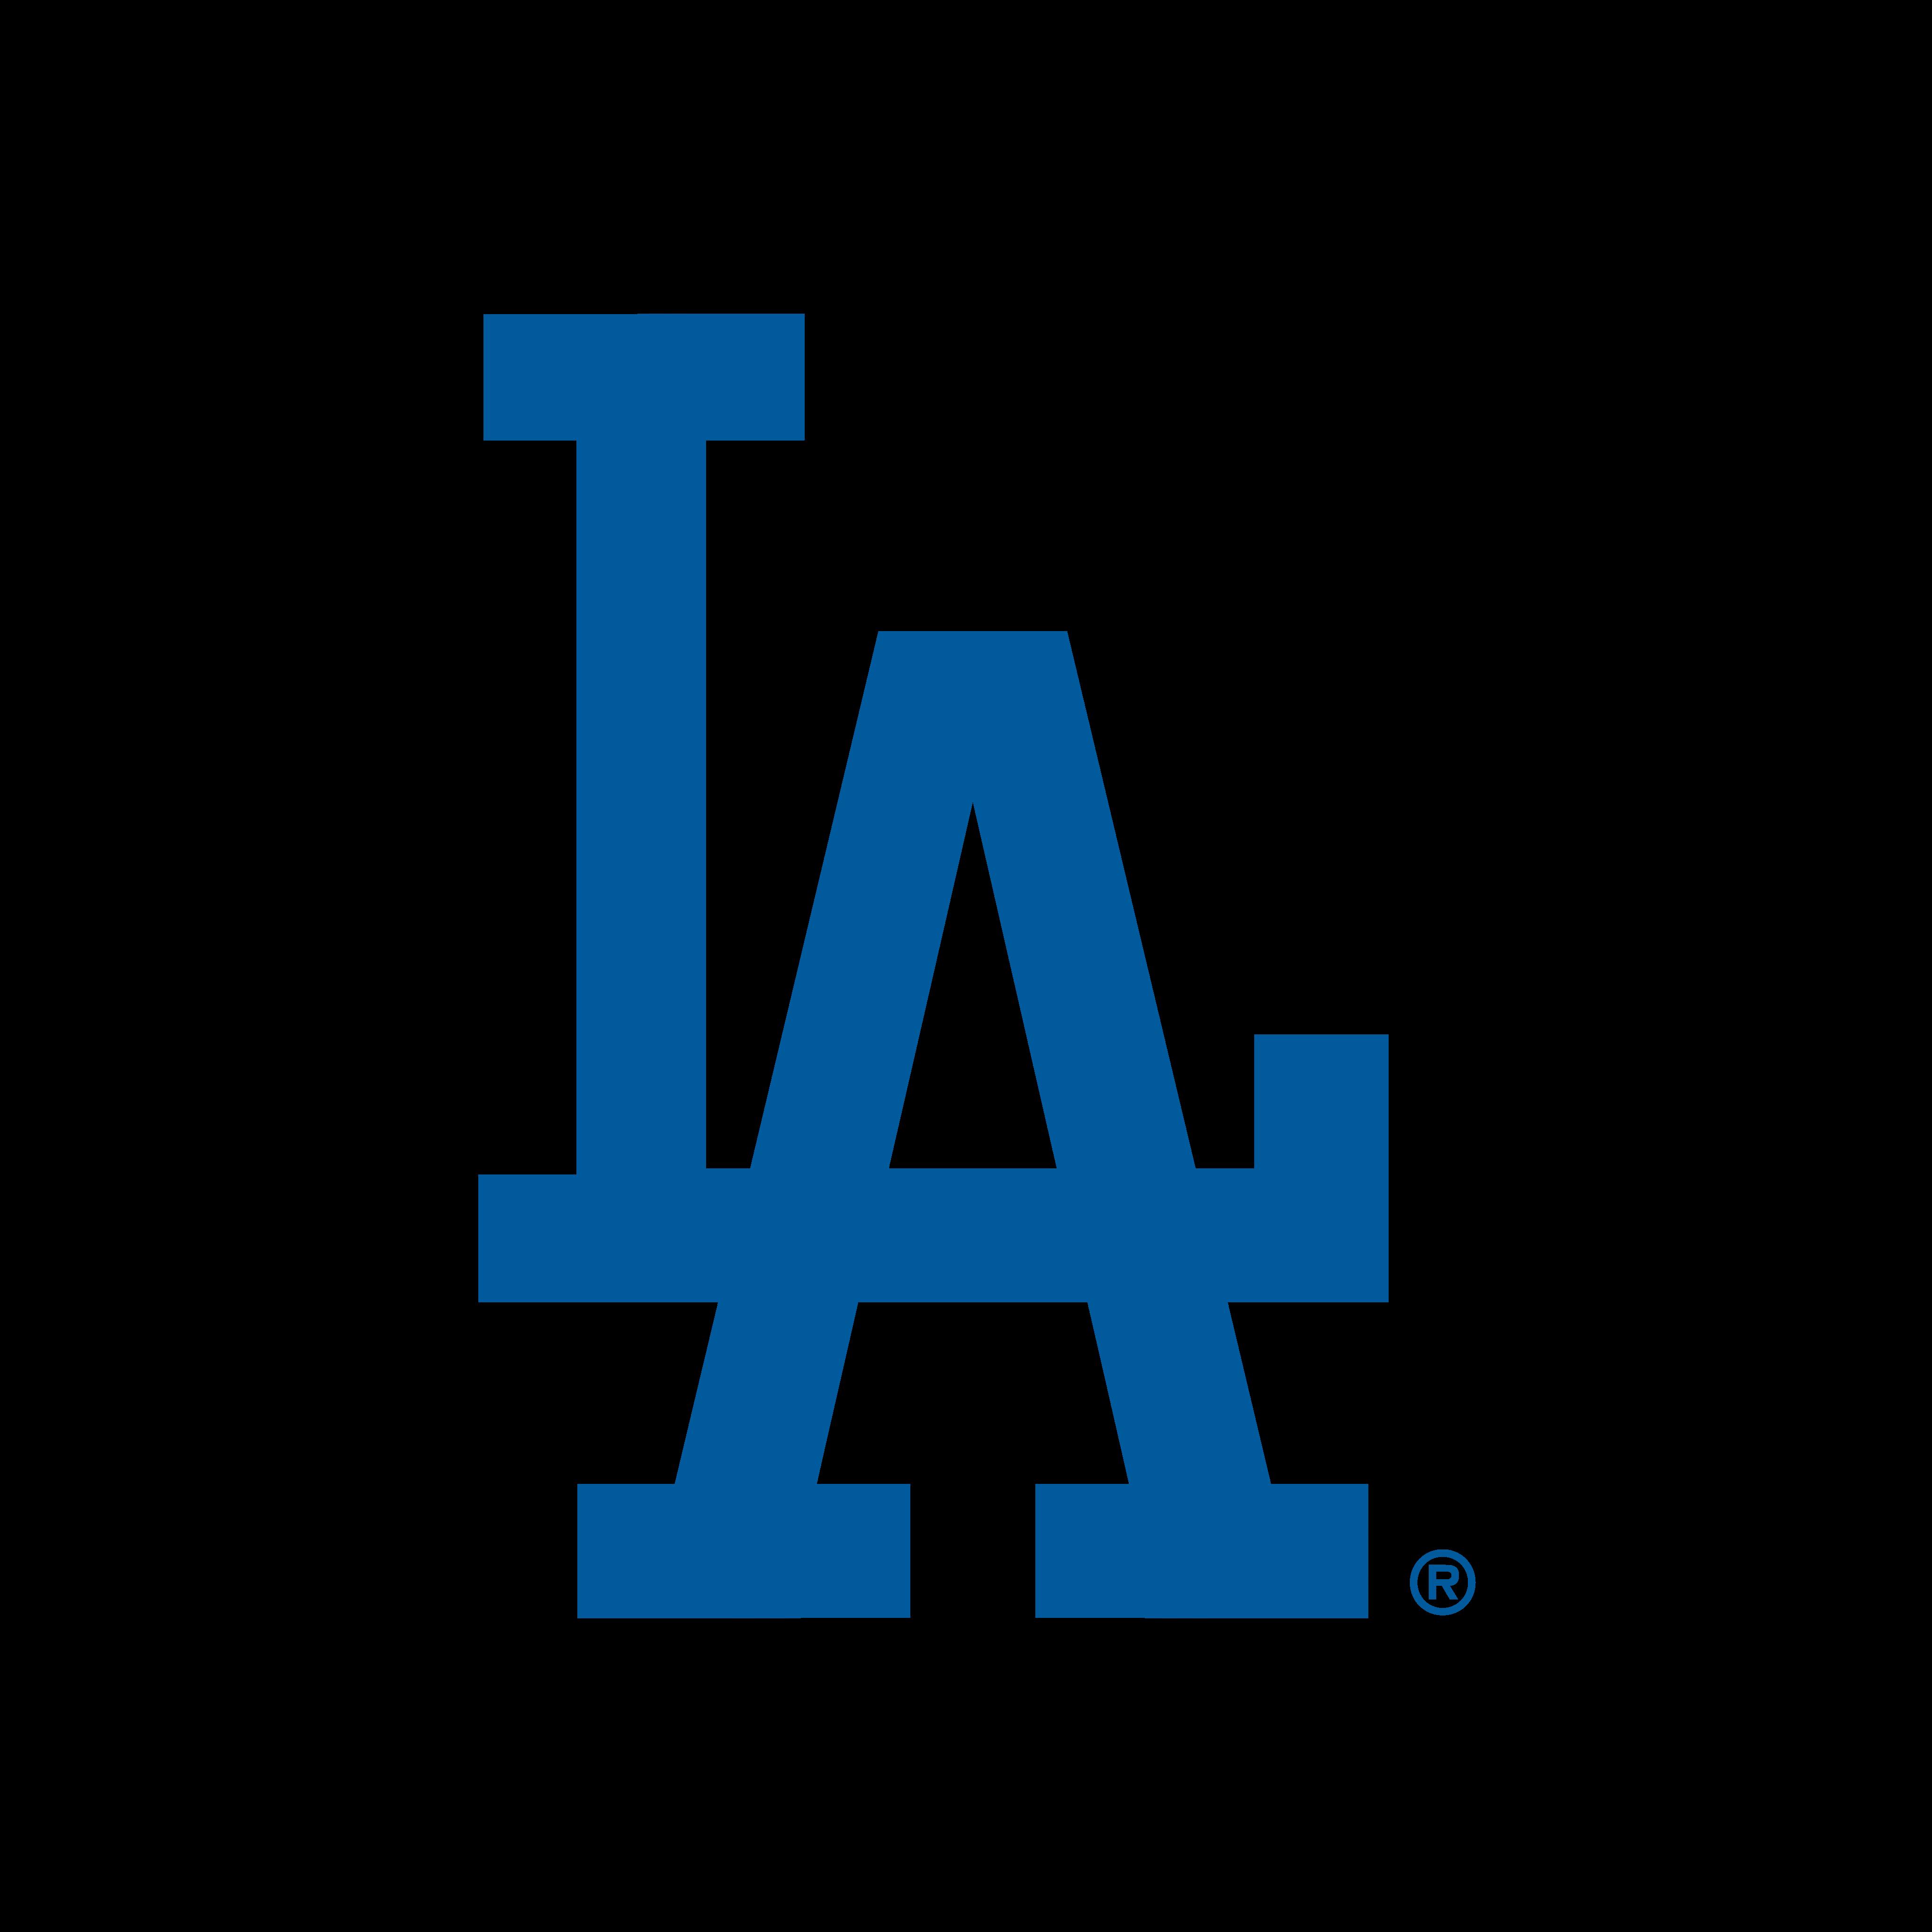 los angeles dodgers logo 0 - Los Angeles Dodgers Logo